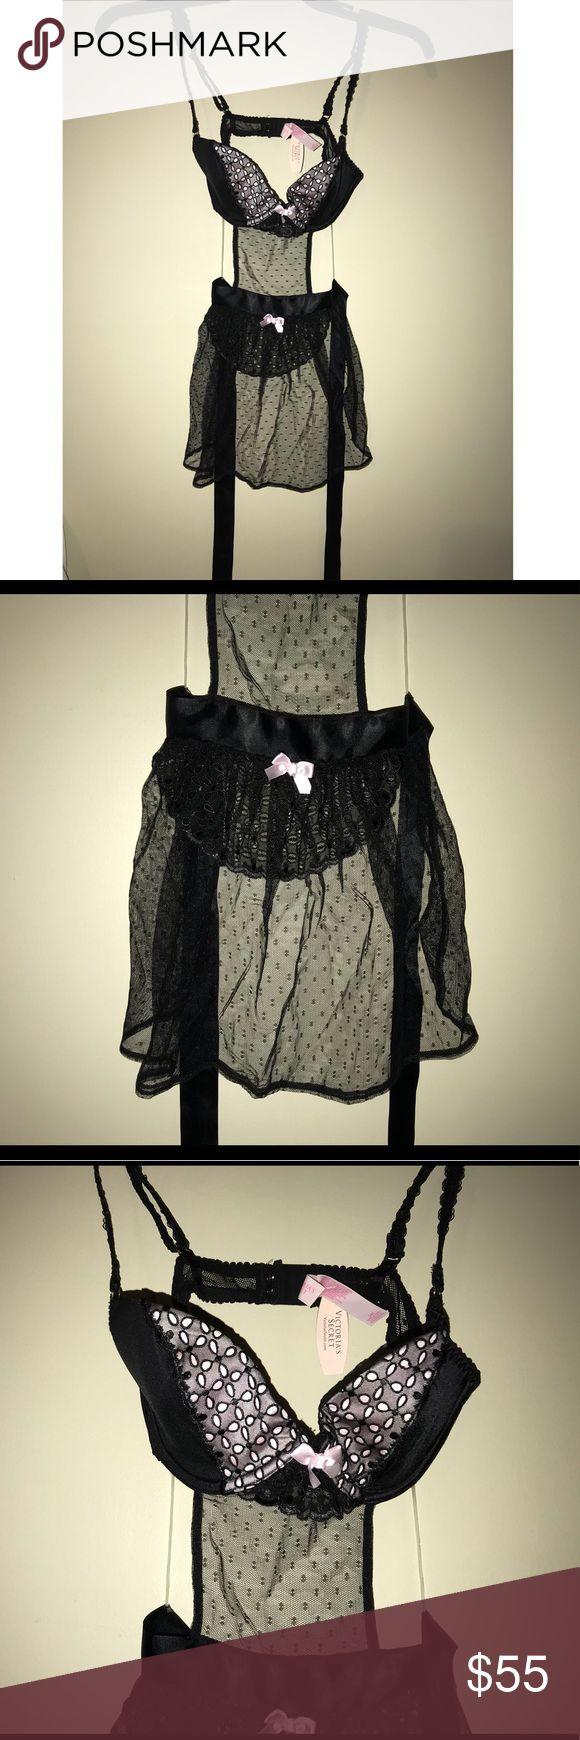 Victoria's Secret Lingerie 34B Brand new Victoria's Secret maid Lingerie size 34B Victoria's Secret Intimates & Sleepwear